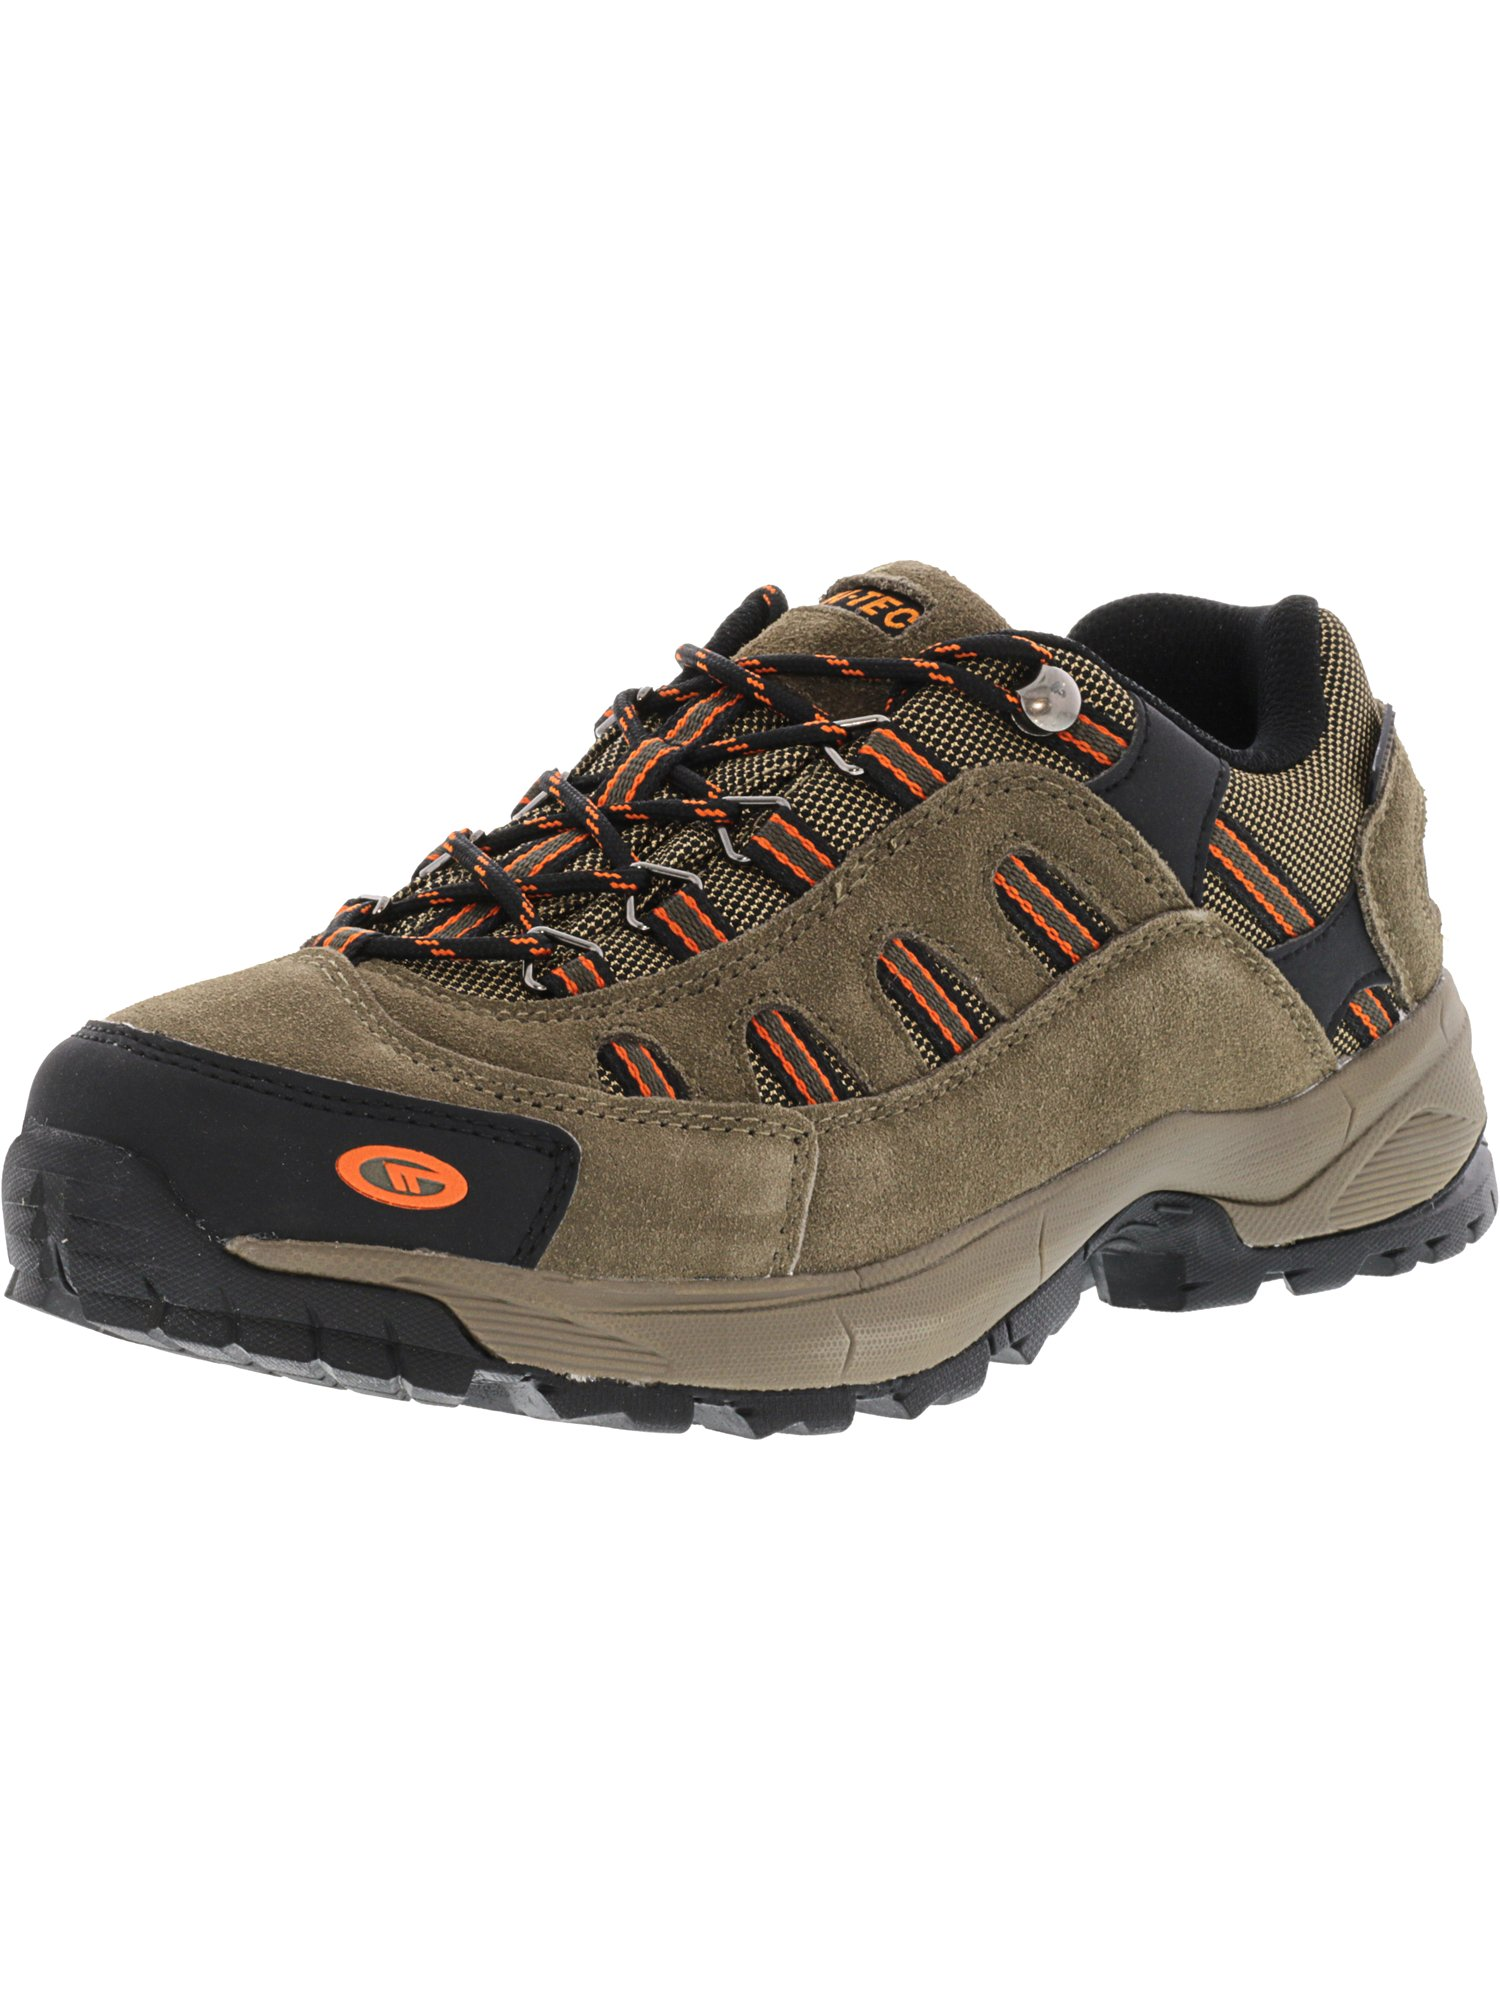 Hi-Tec Men's Bandera Ultra Low Waterproof Smokey Brown / Light Taupe Burnt Orange Ankle-High Leather Hiking Shoe - 9M